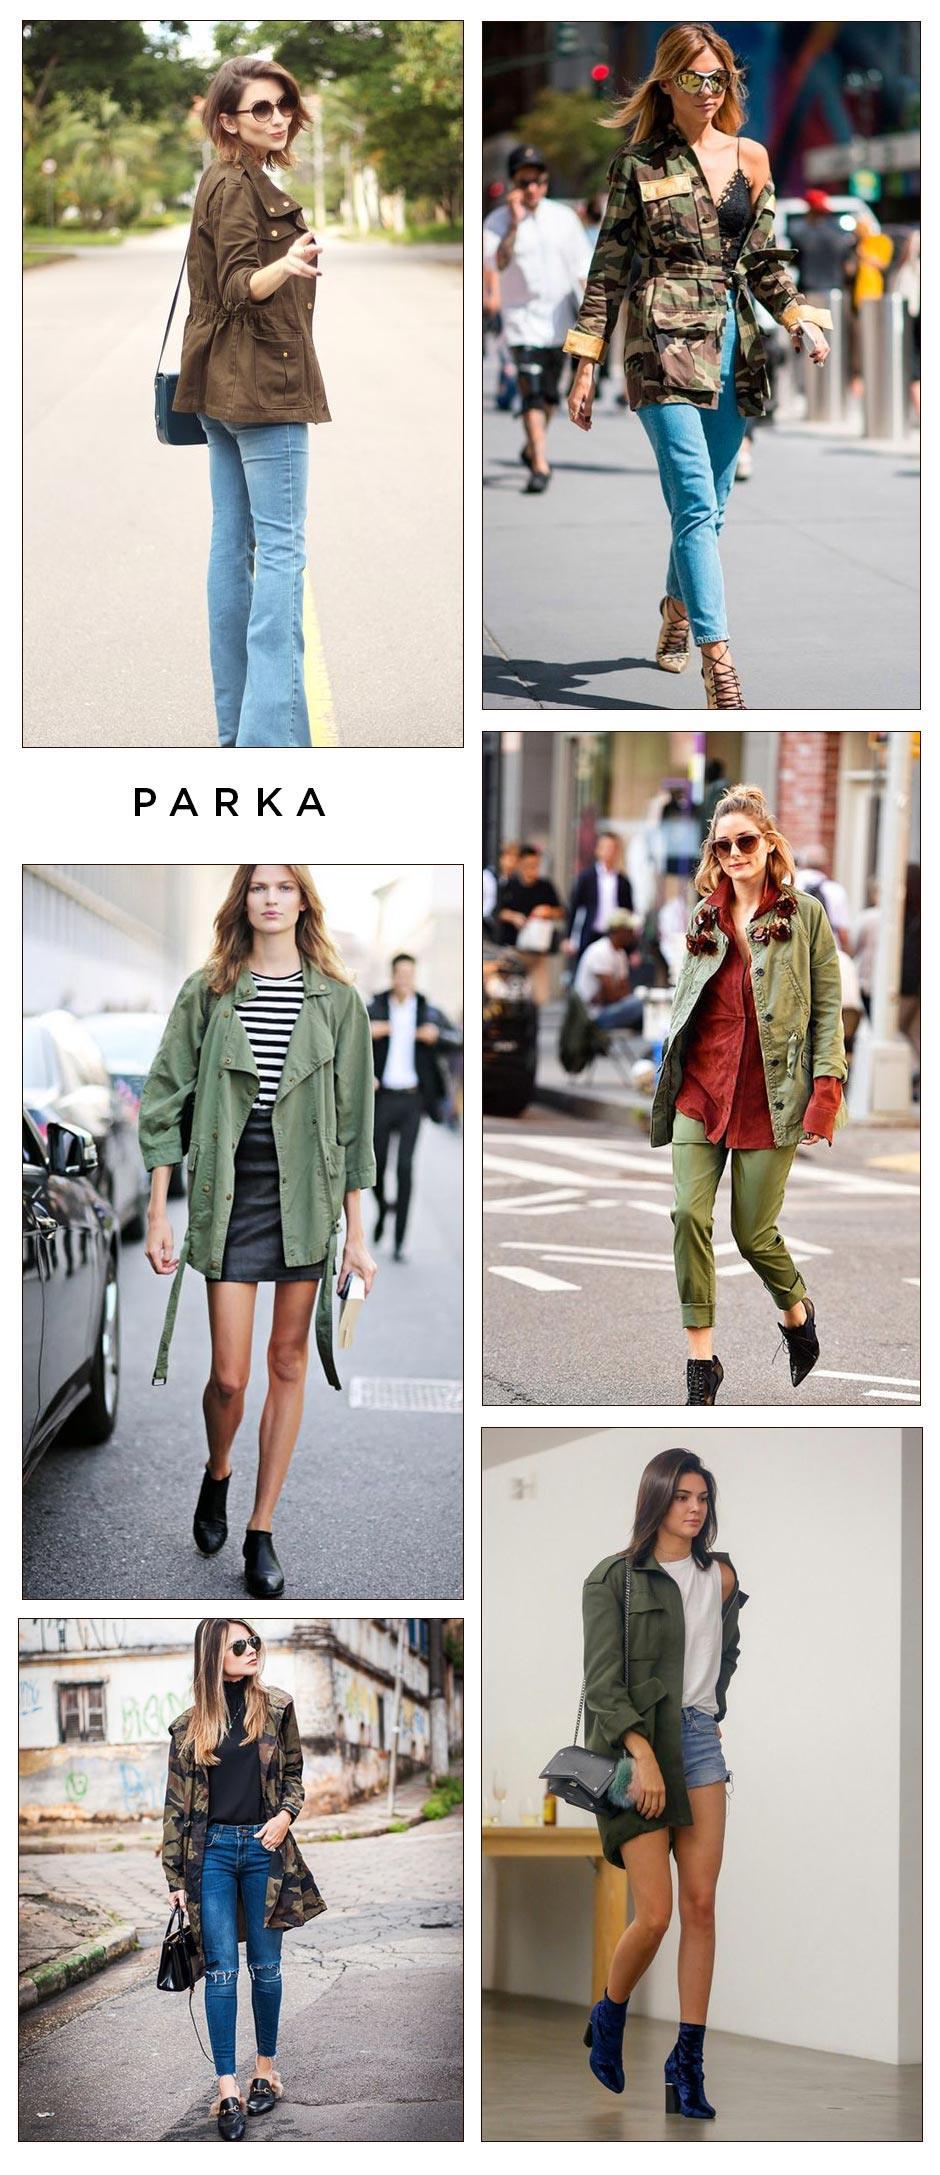 parka street style